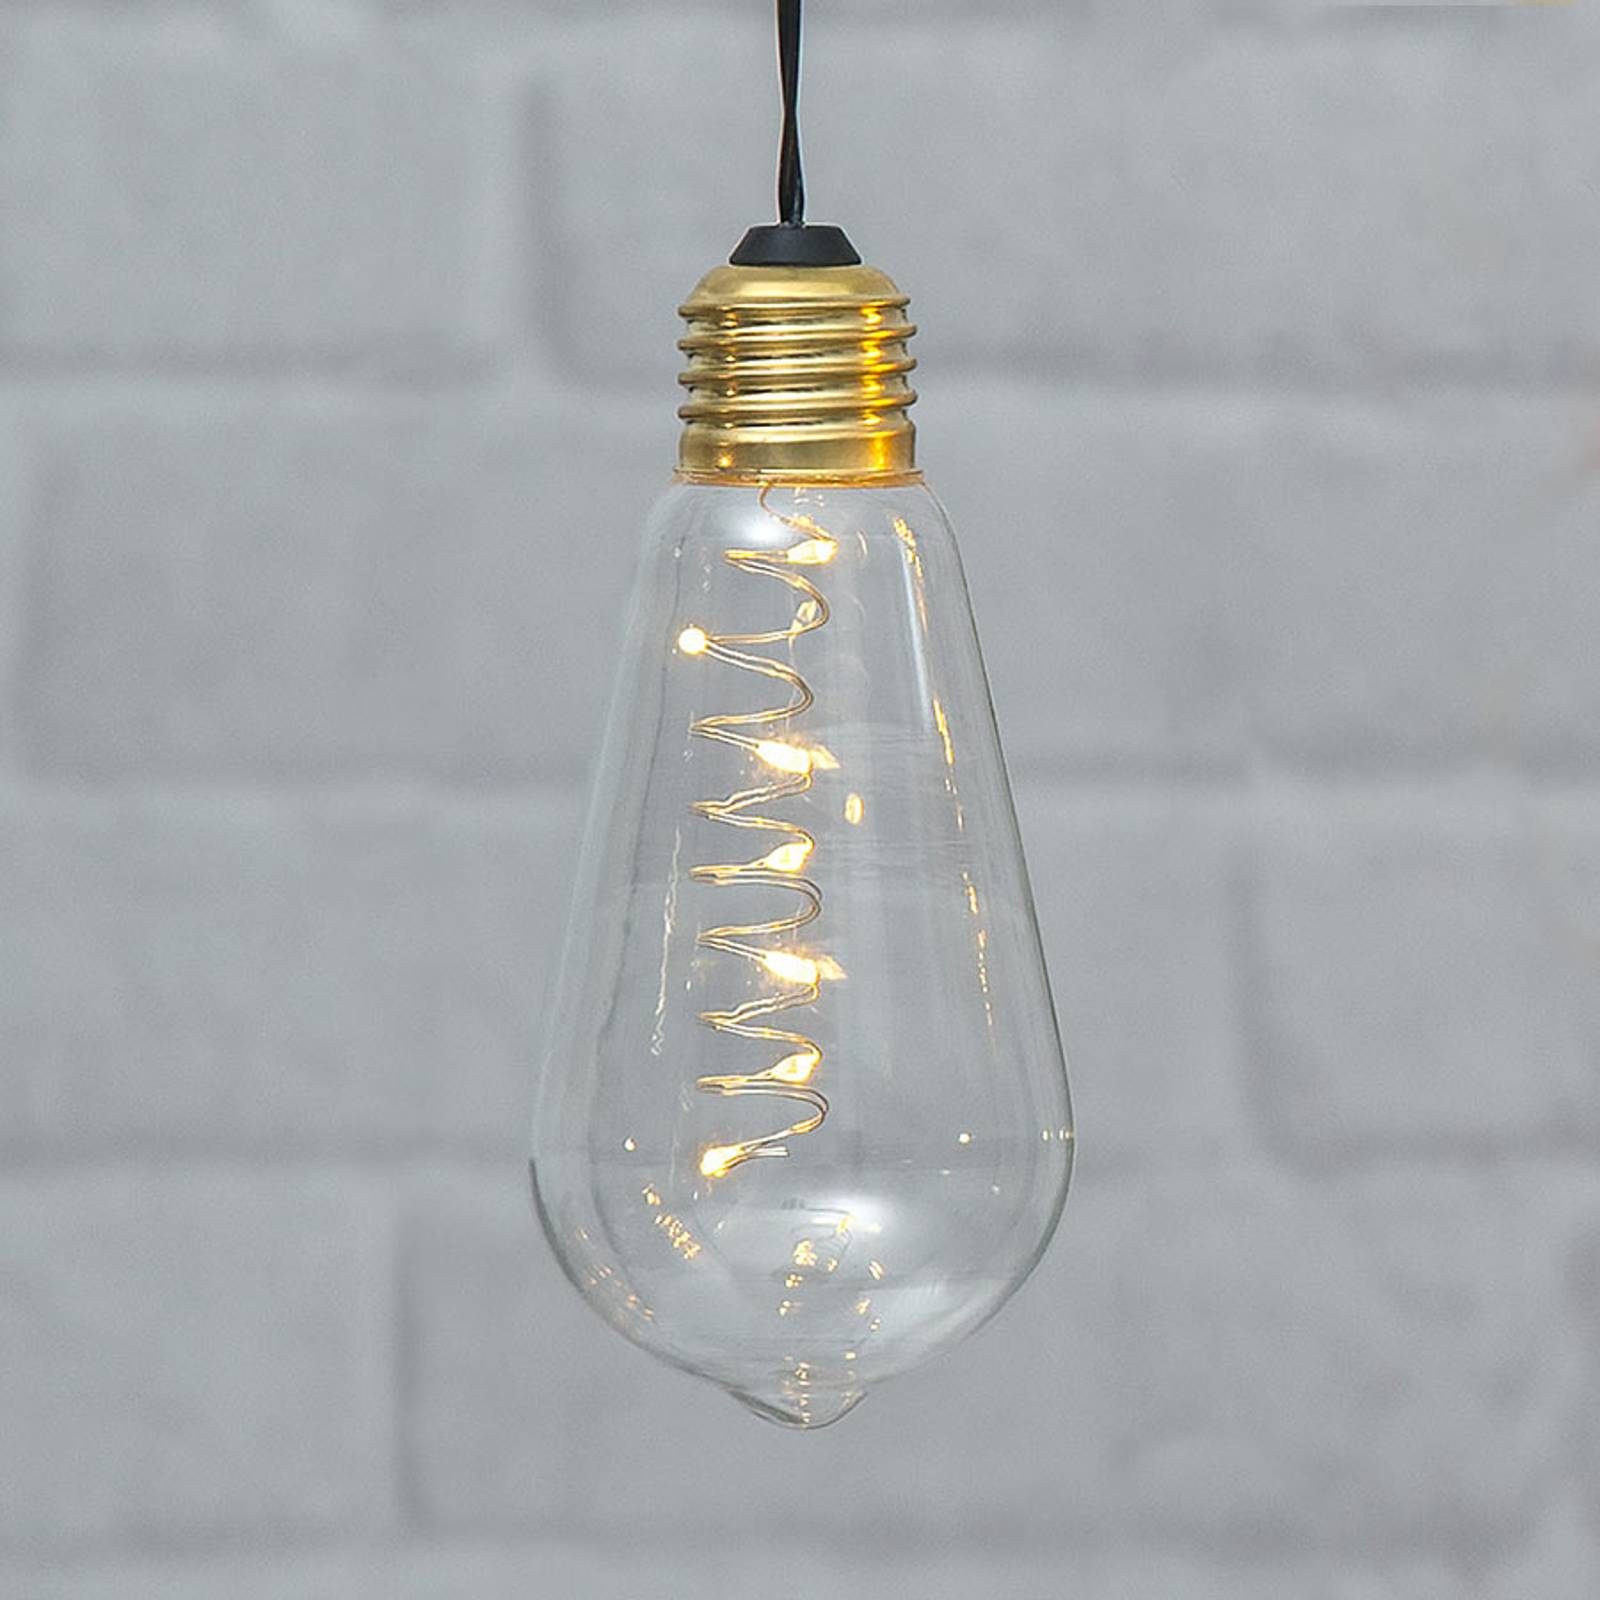 Lampada LED vintage Glow con timer, trasparente